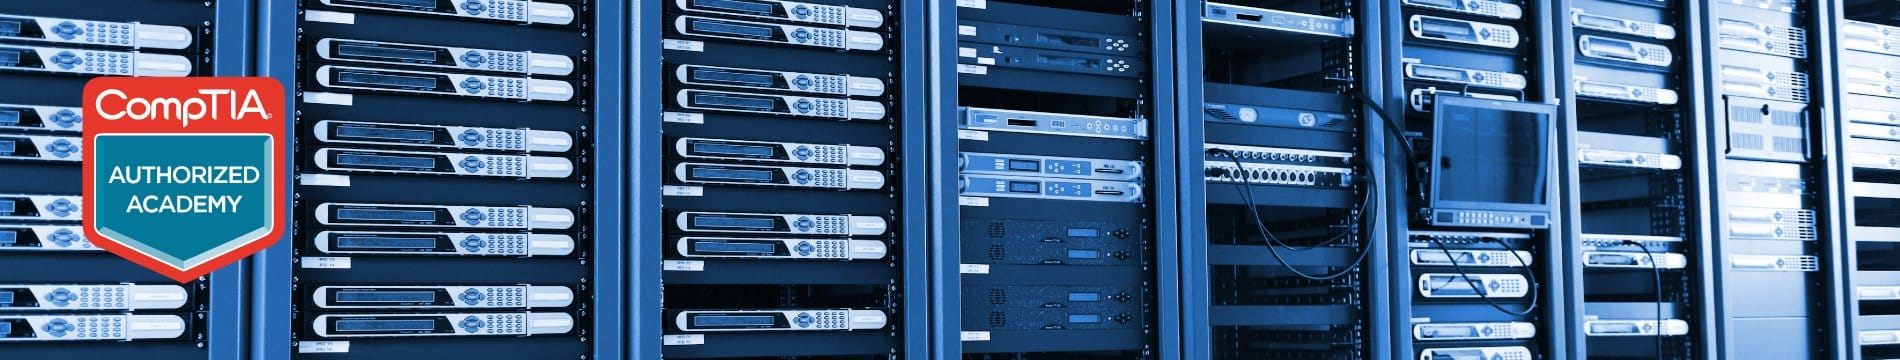 Corsi Comptia linux, Corsi Comptia Server